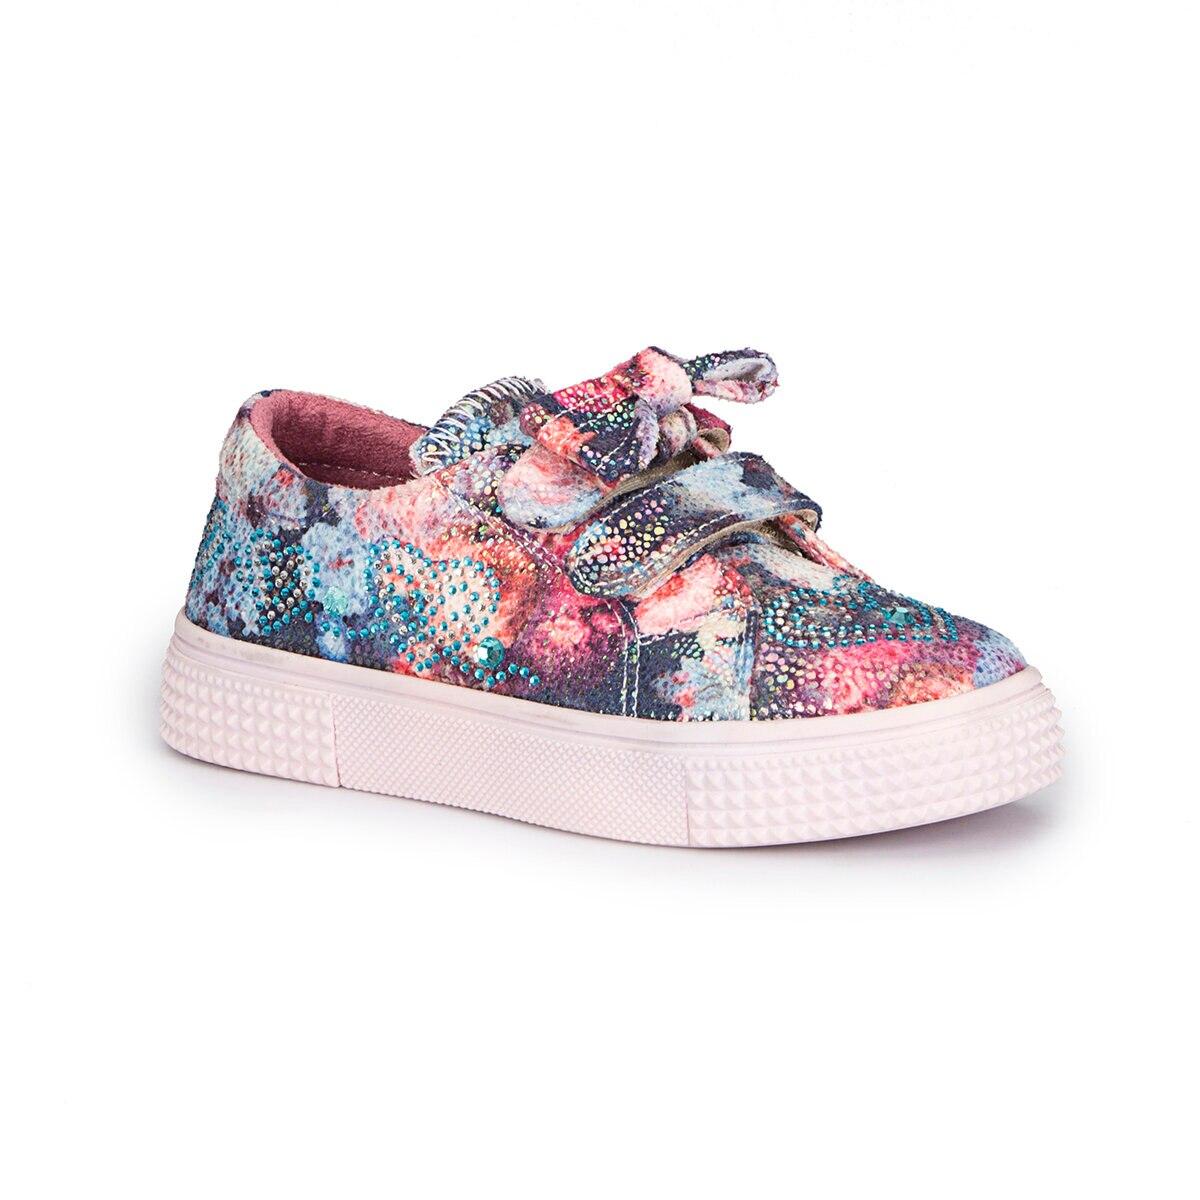 FLO STER-1 Multicolour Female Child Sneaker Shoes PINKSTEP